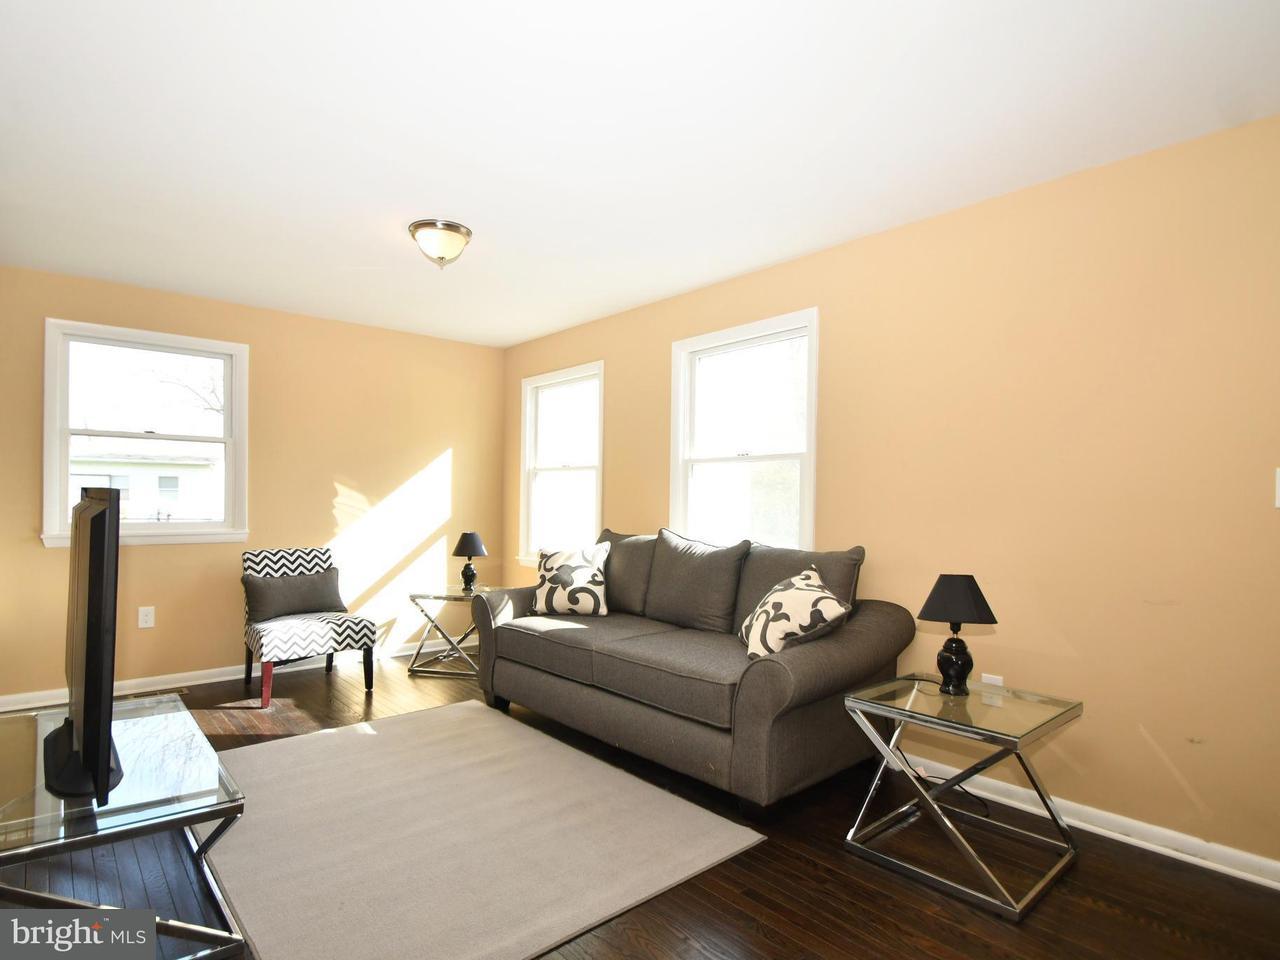 327 Riverside Dr Baltimore Md Real Estate Listing Mls